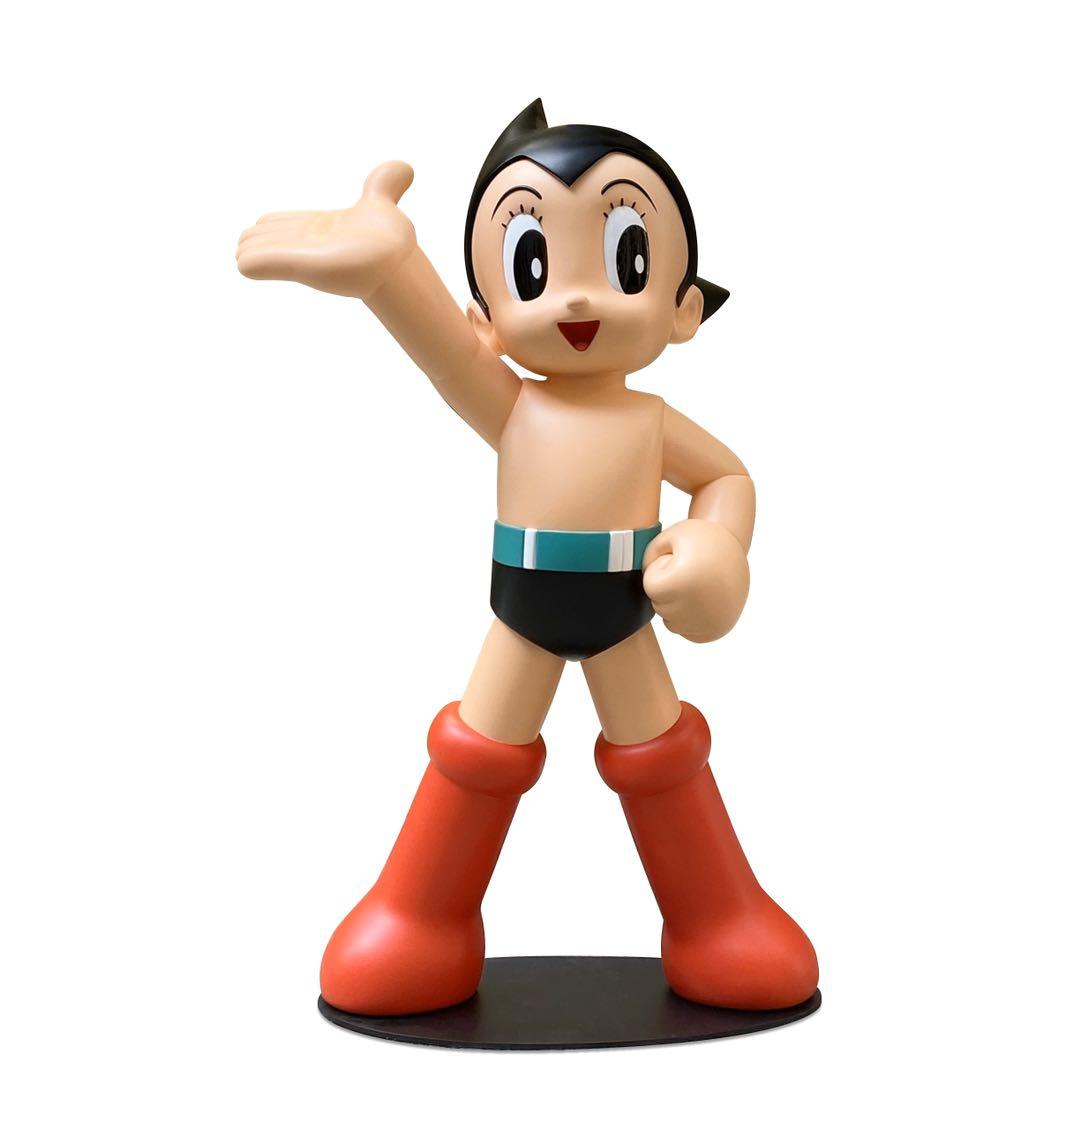 TokyoToys 巨型 小飛俠 正版鐵臂阿童木 模型 限量版收藏品 擺件